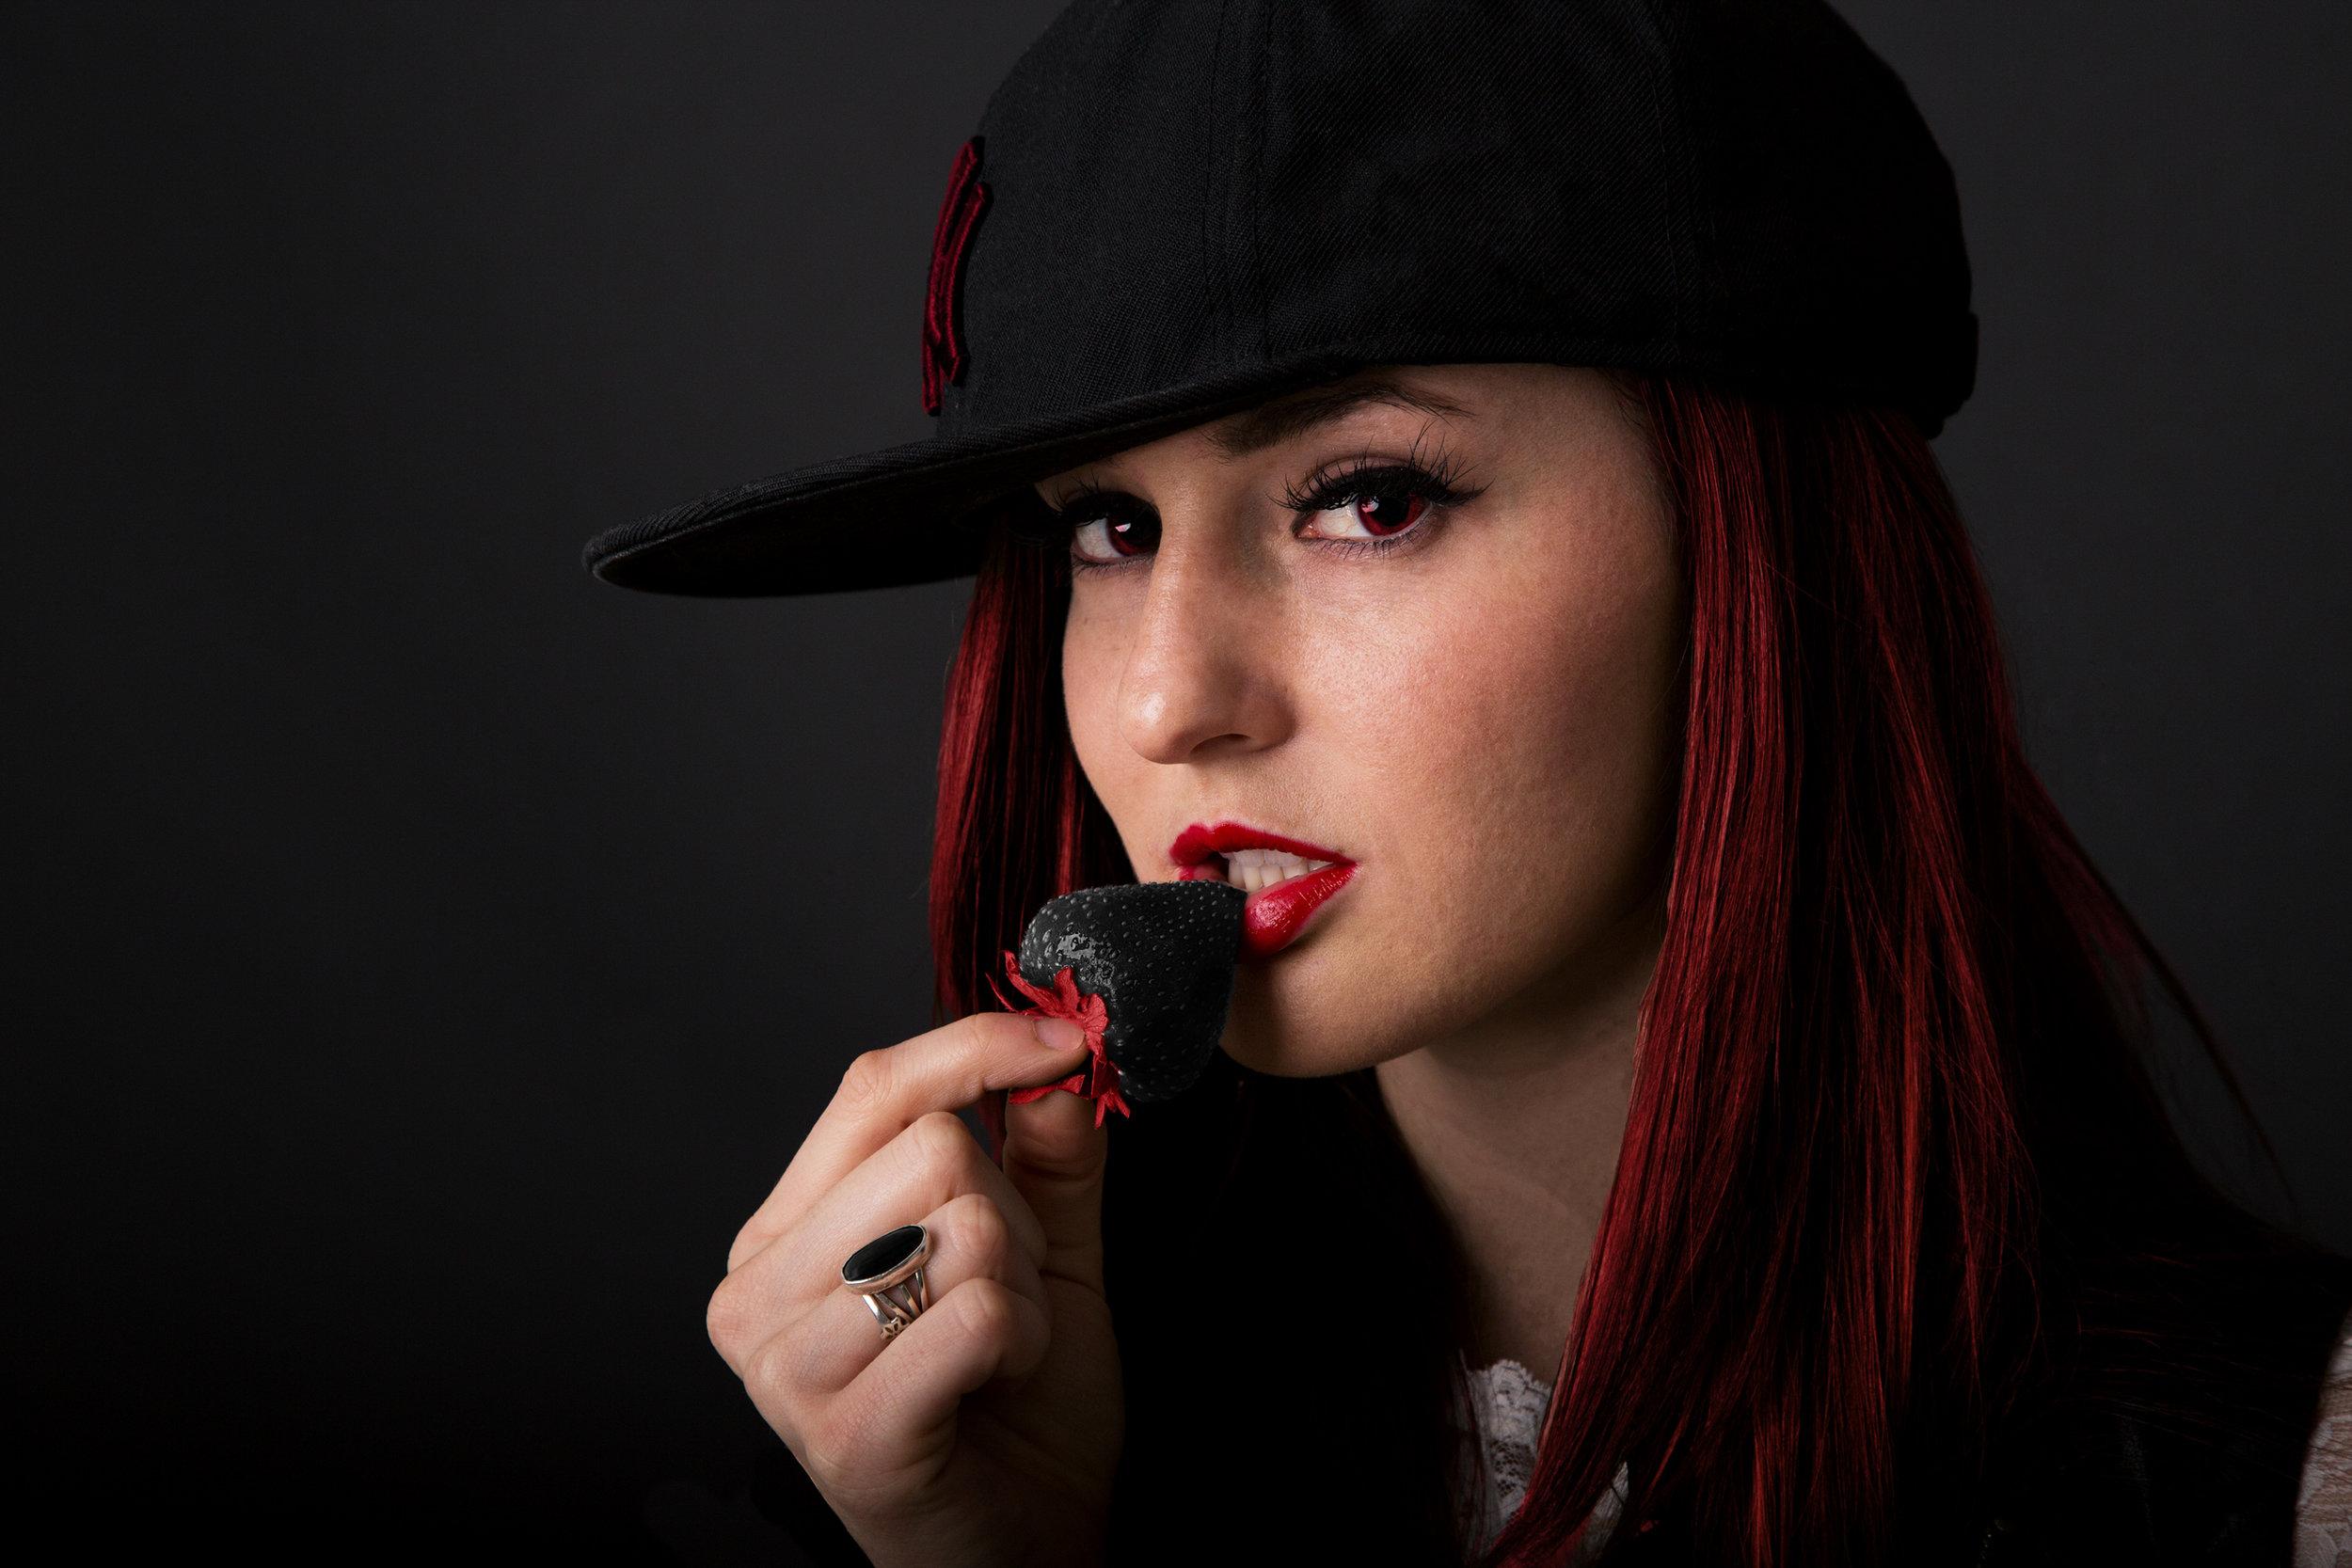 portrait_photography_justinography-0953.jpg